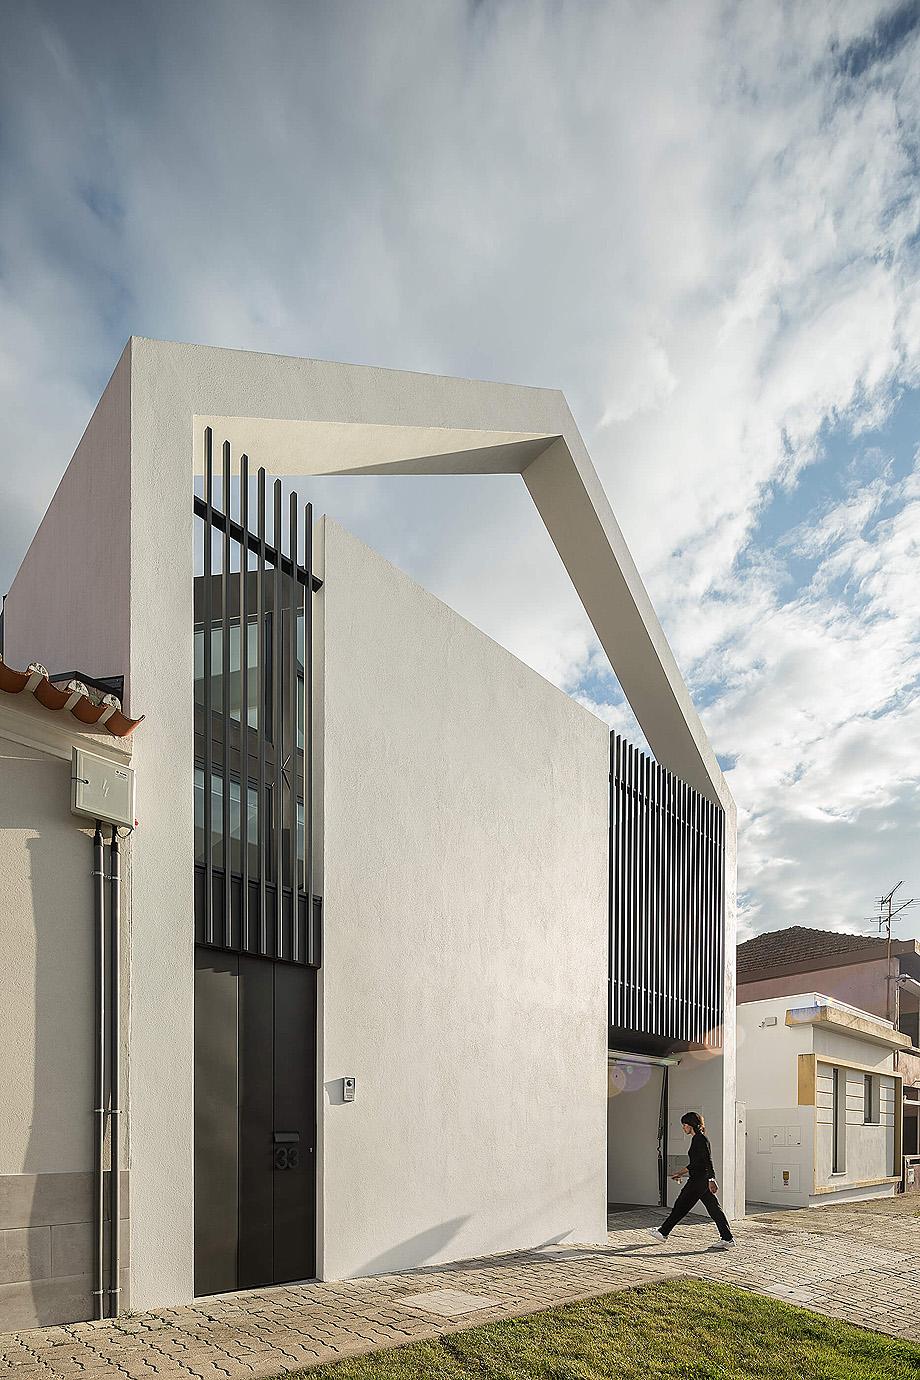 casa do arco de frari architecture network - foto ivo tavares (37)